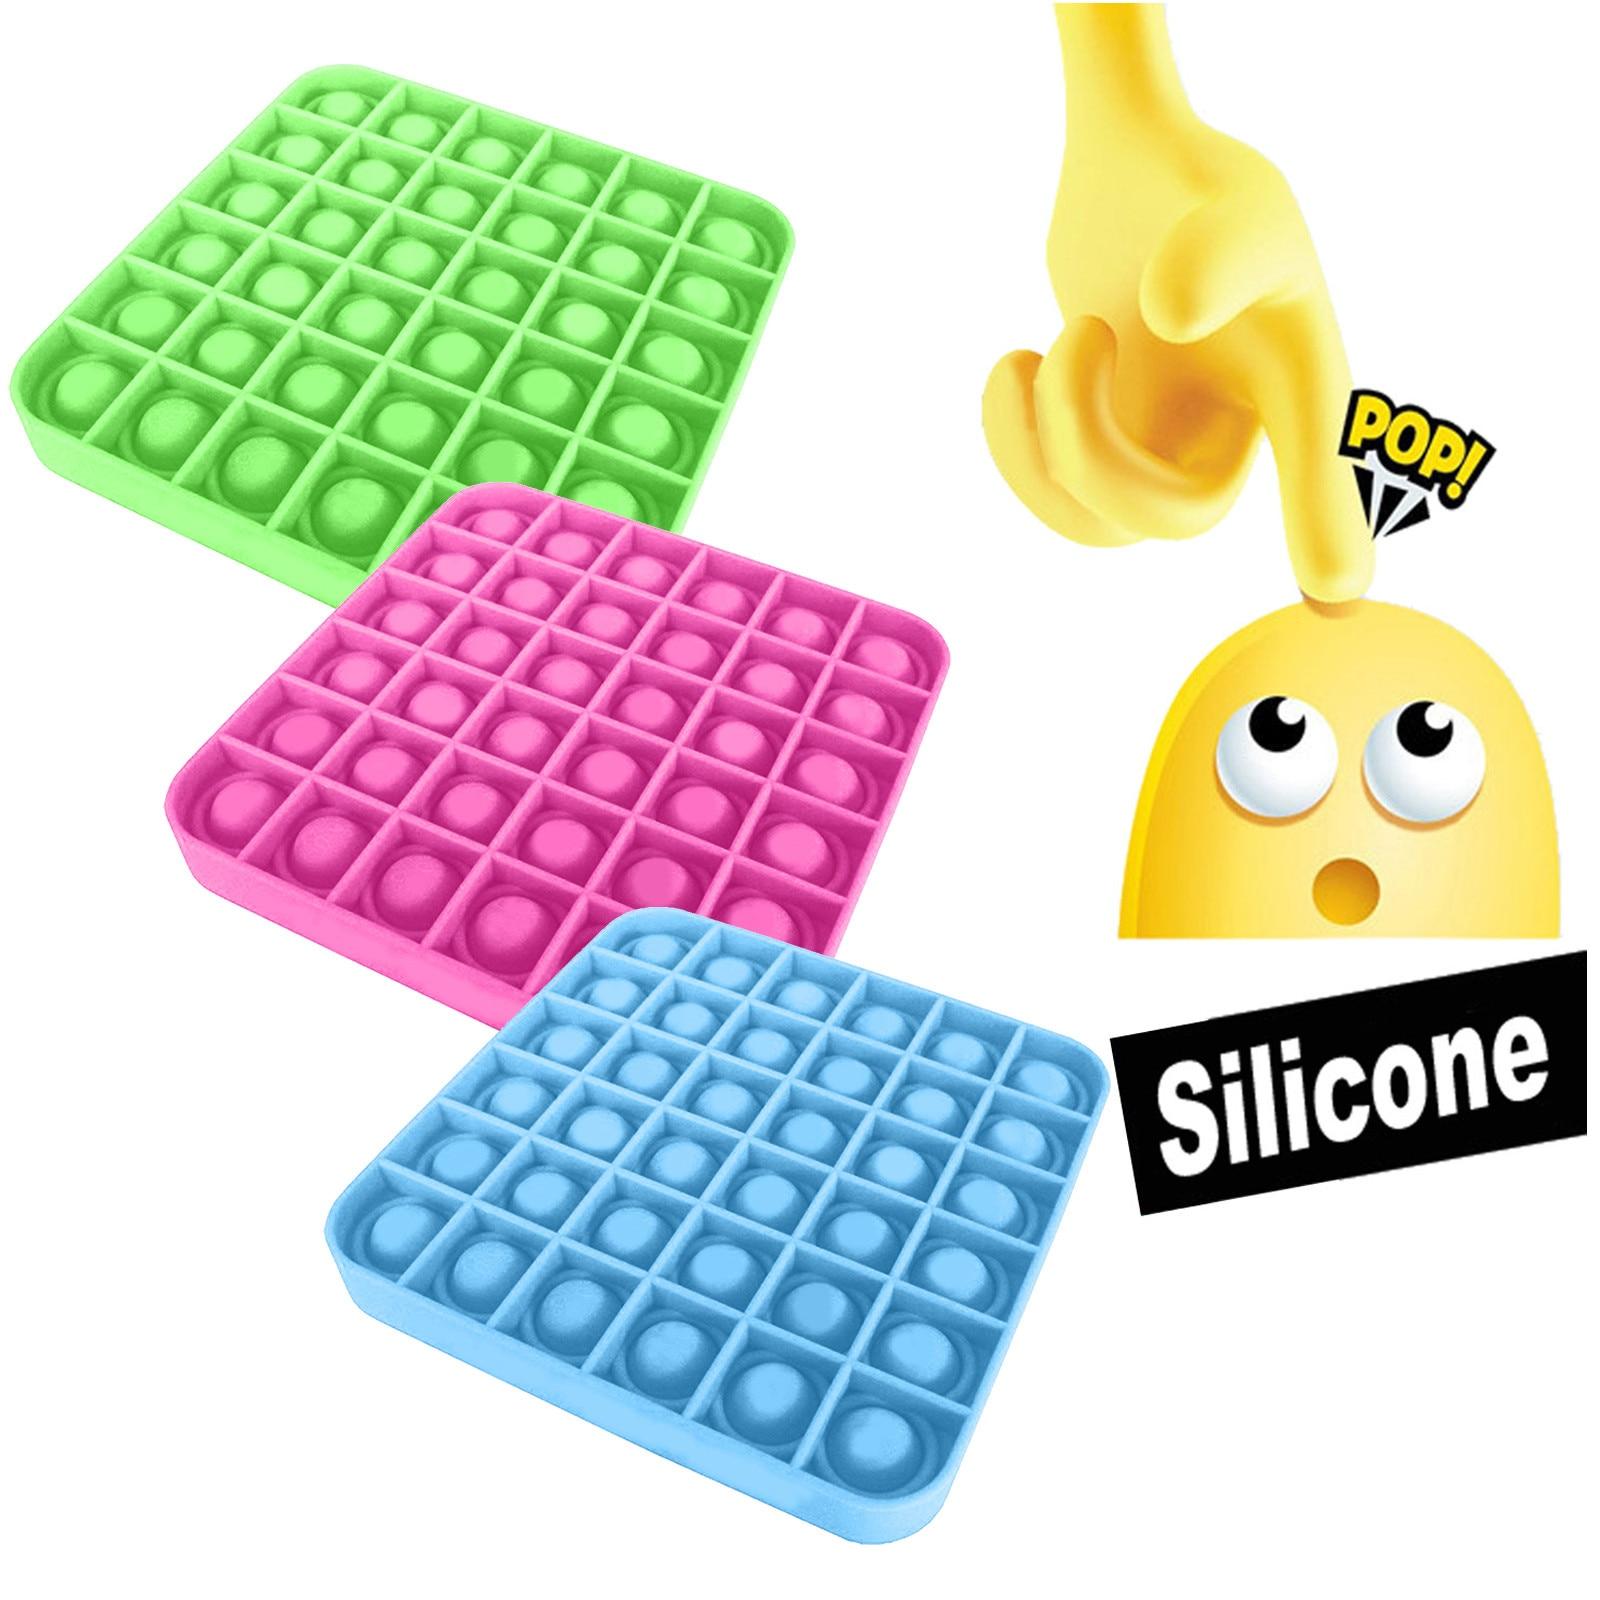 Toy Fidget-Toys Sensory-Toy Autism Needs-Stress Push Bubble Popit Special Simple Dimple img3